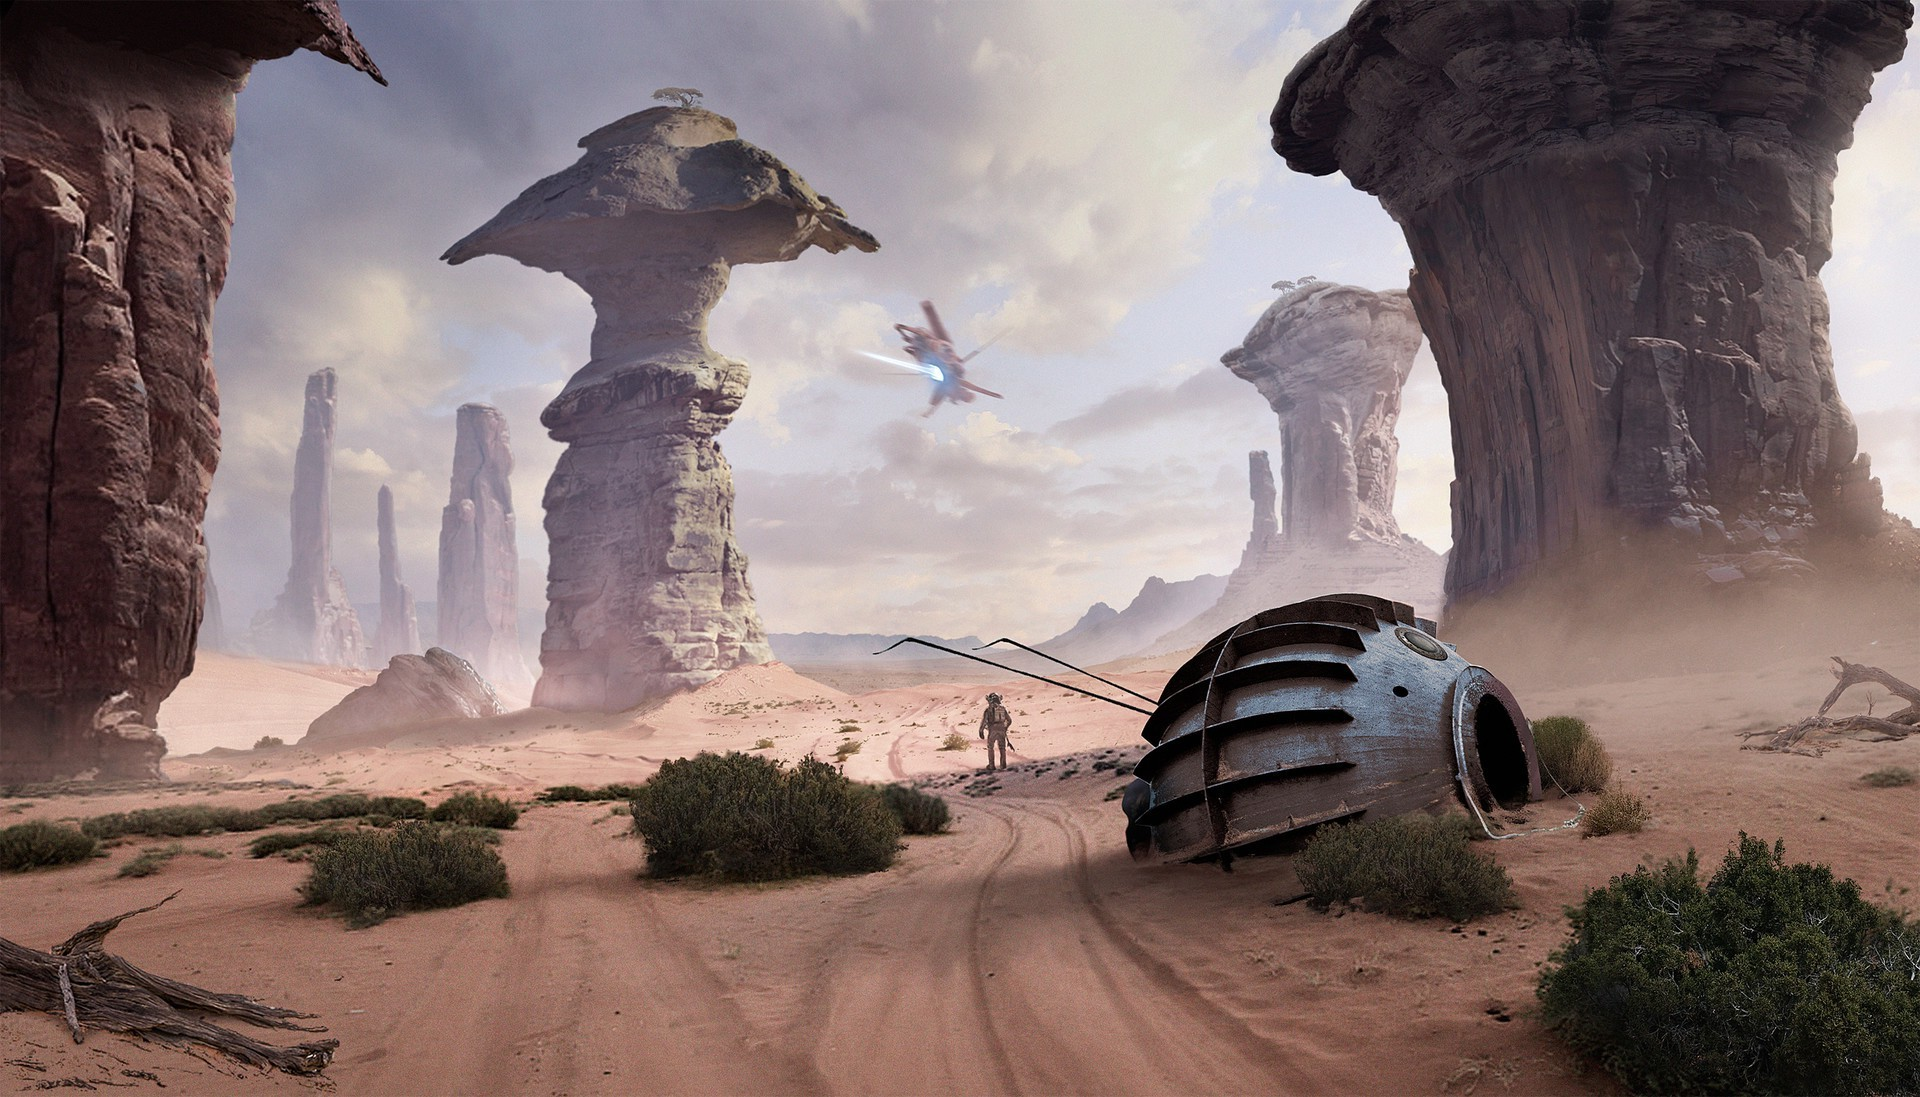 Star Wars Landscape Wallpaper